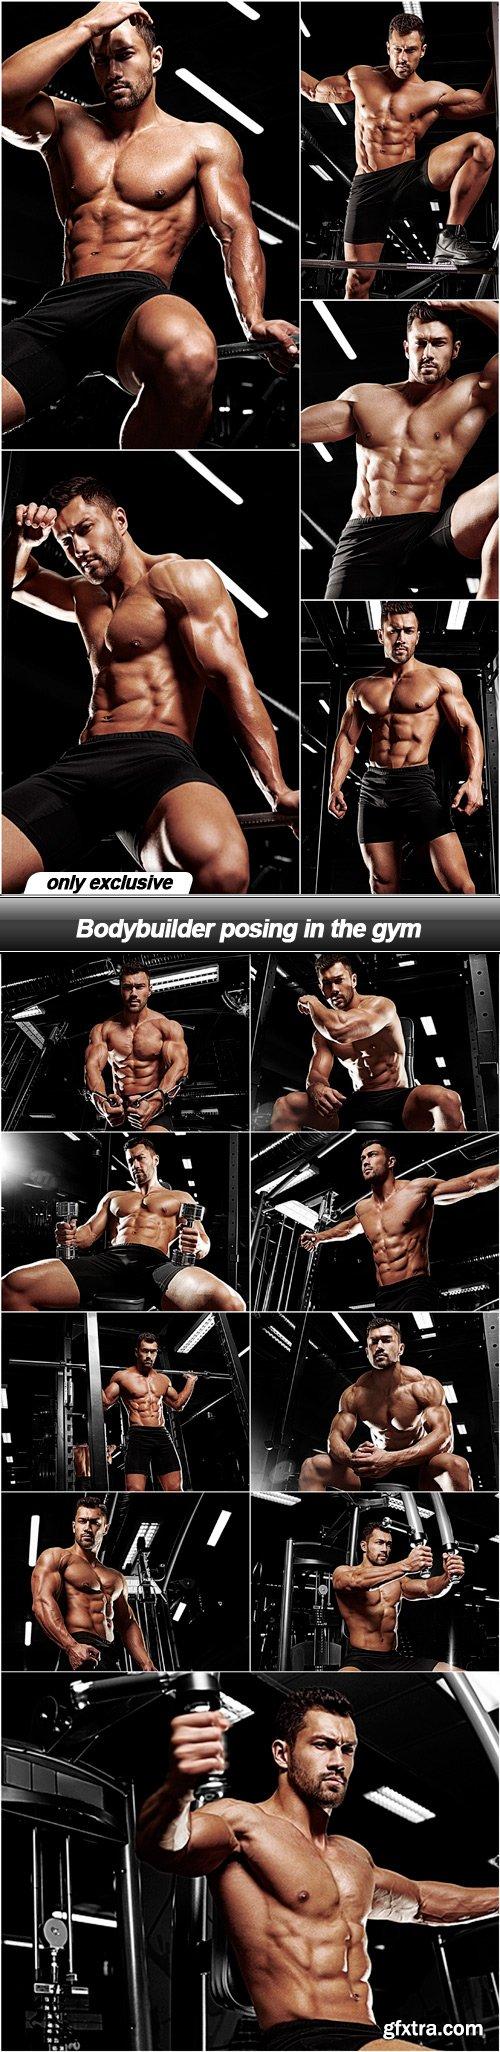 Bodybuilder posing in the gym - 14 UHQ JPEG